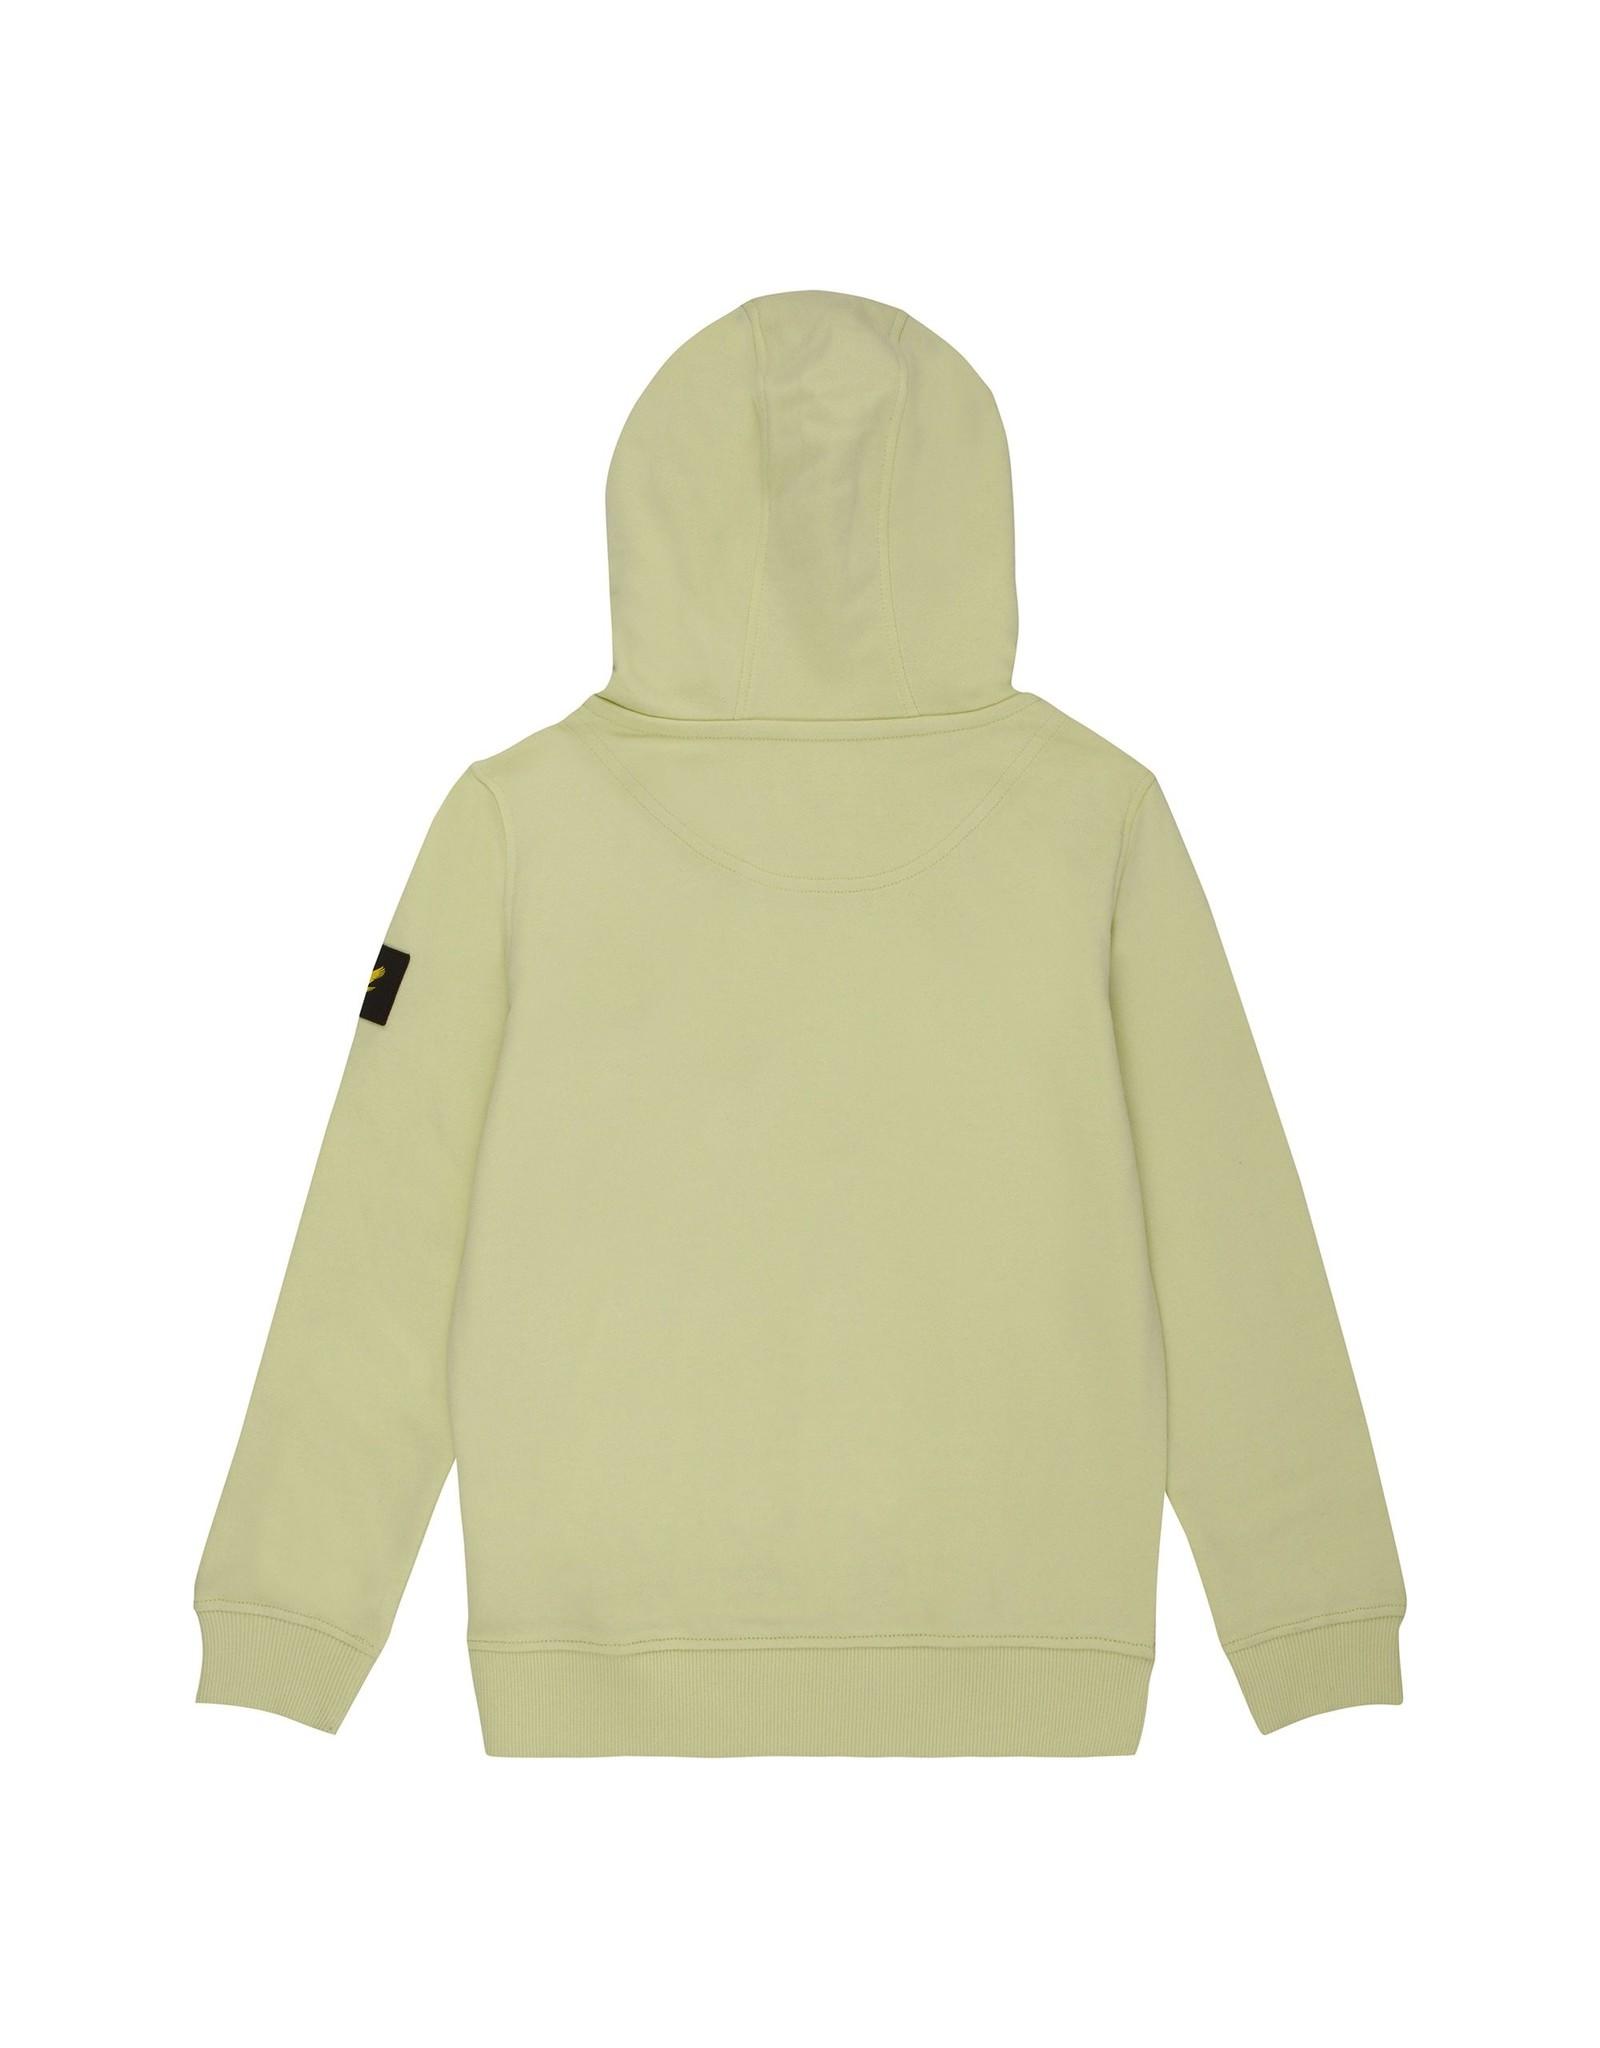 Lyle & Scott Boys Angle Zip LB Hoodie Lime Cream